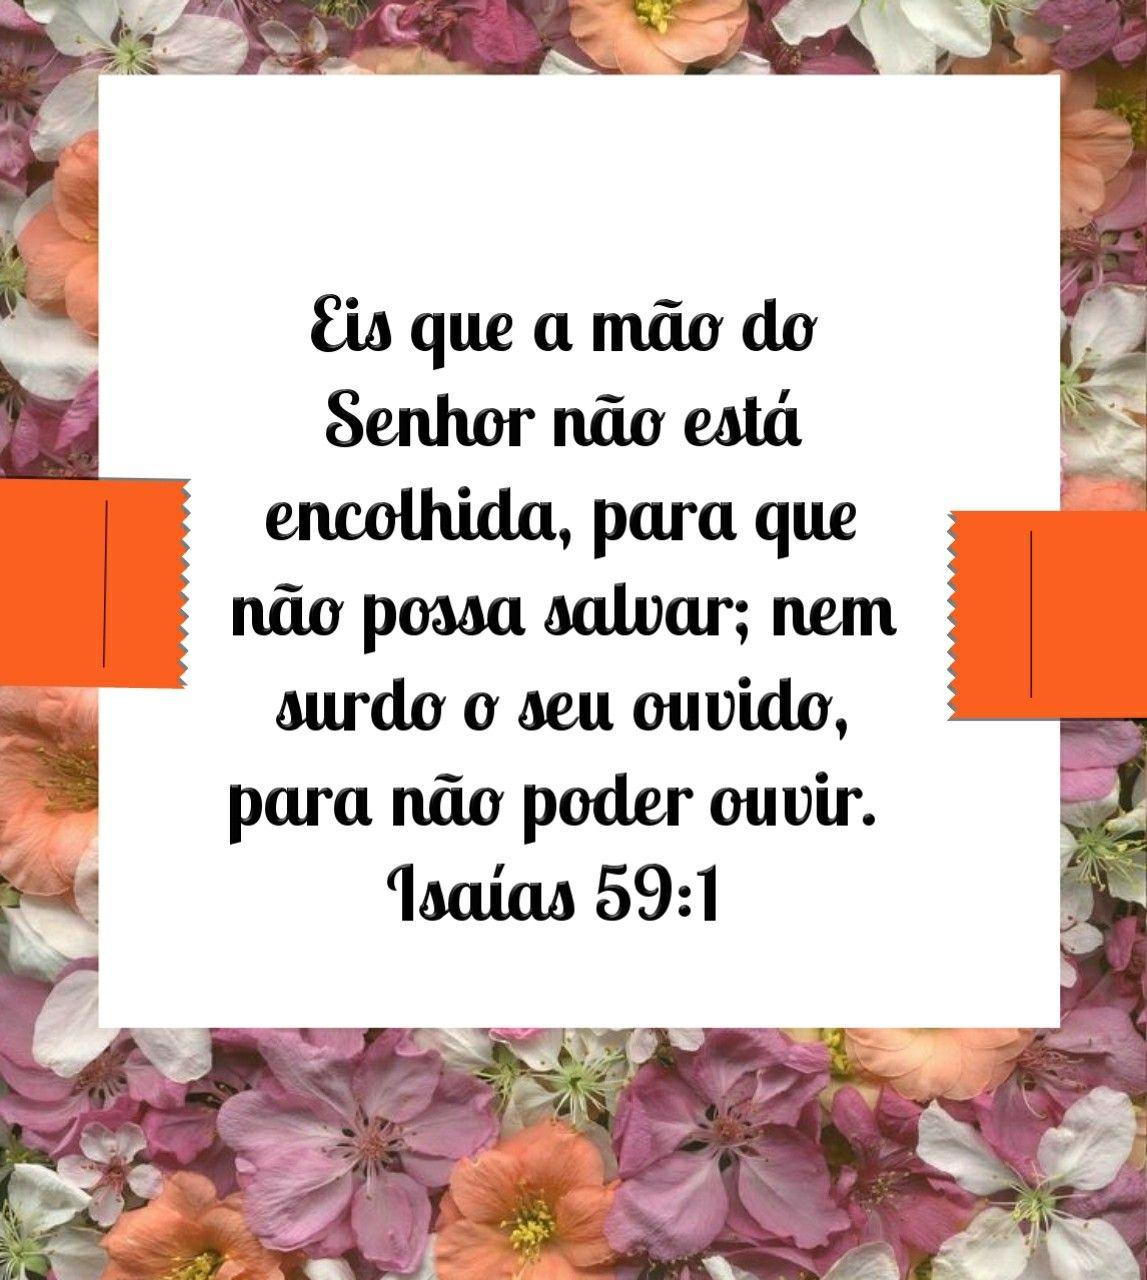 Isaias 59 1 Palavra De Deus Palavra Palavras Do Senhor